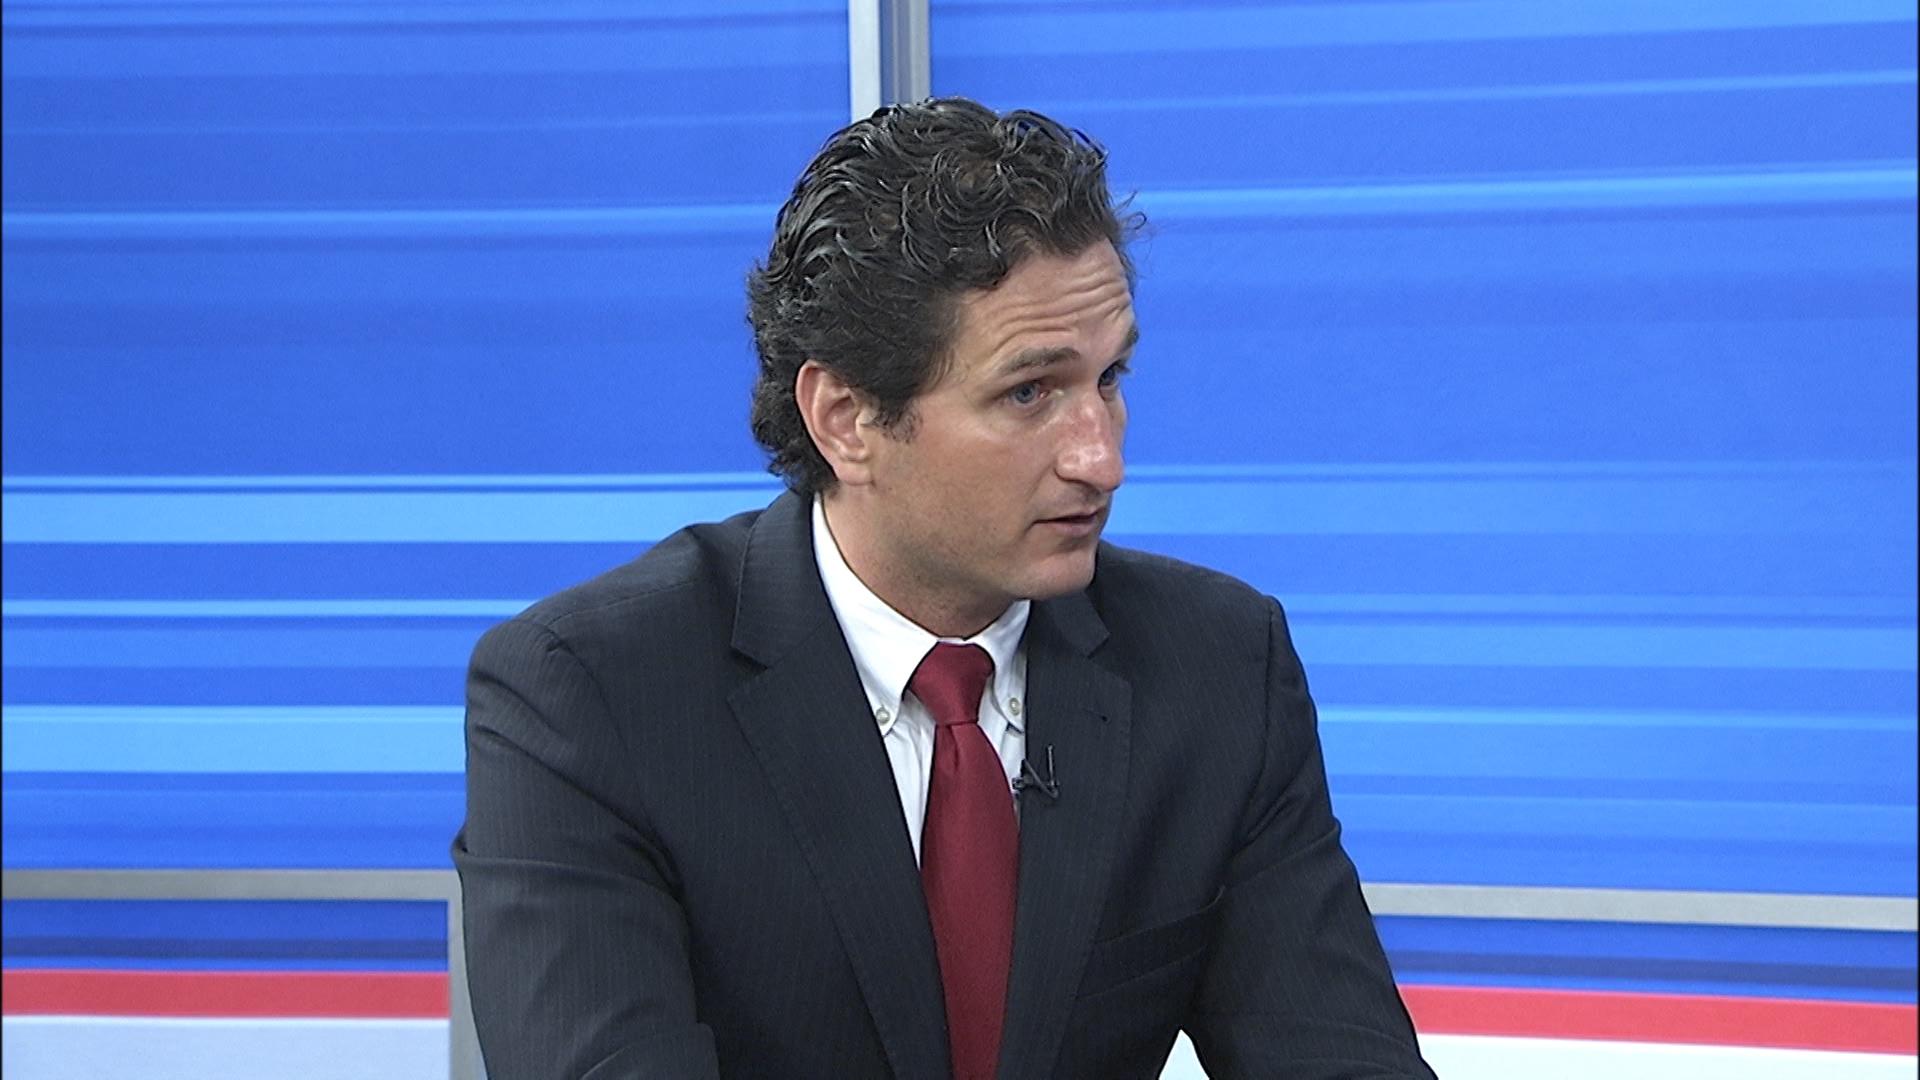 Newsmakers 11/30/2018: Blake Filippi; Georgia Hollister Isman